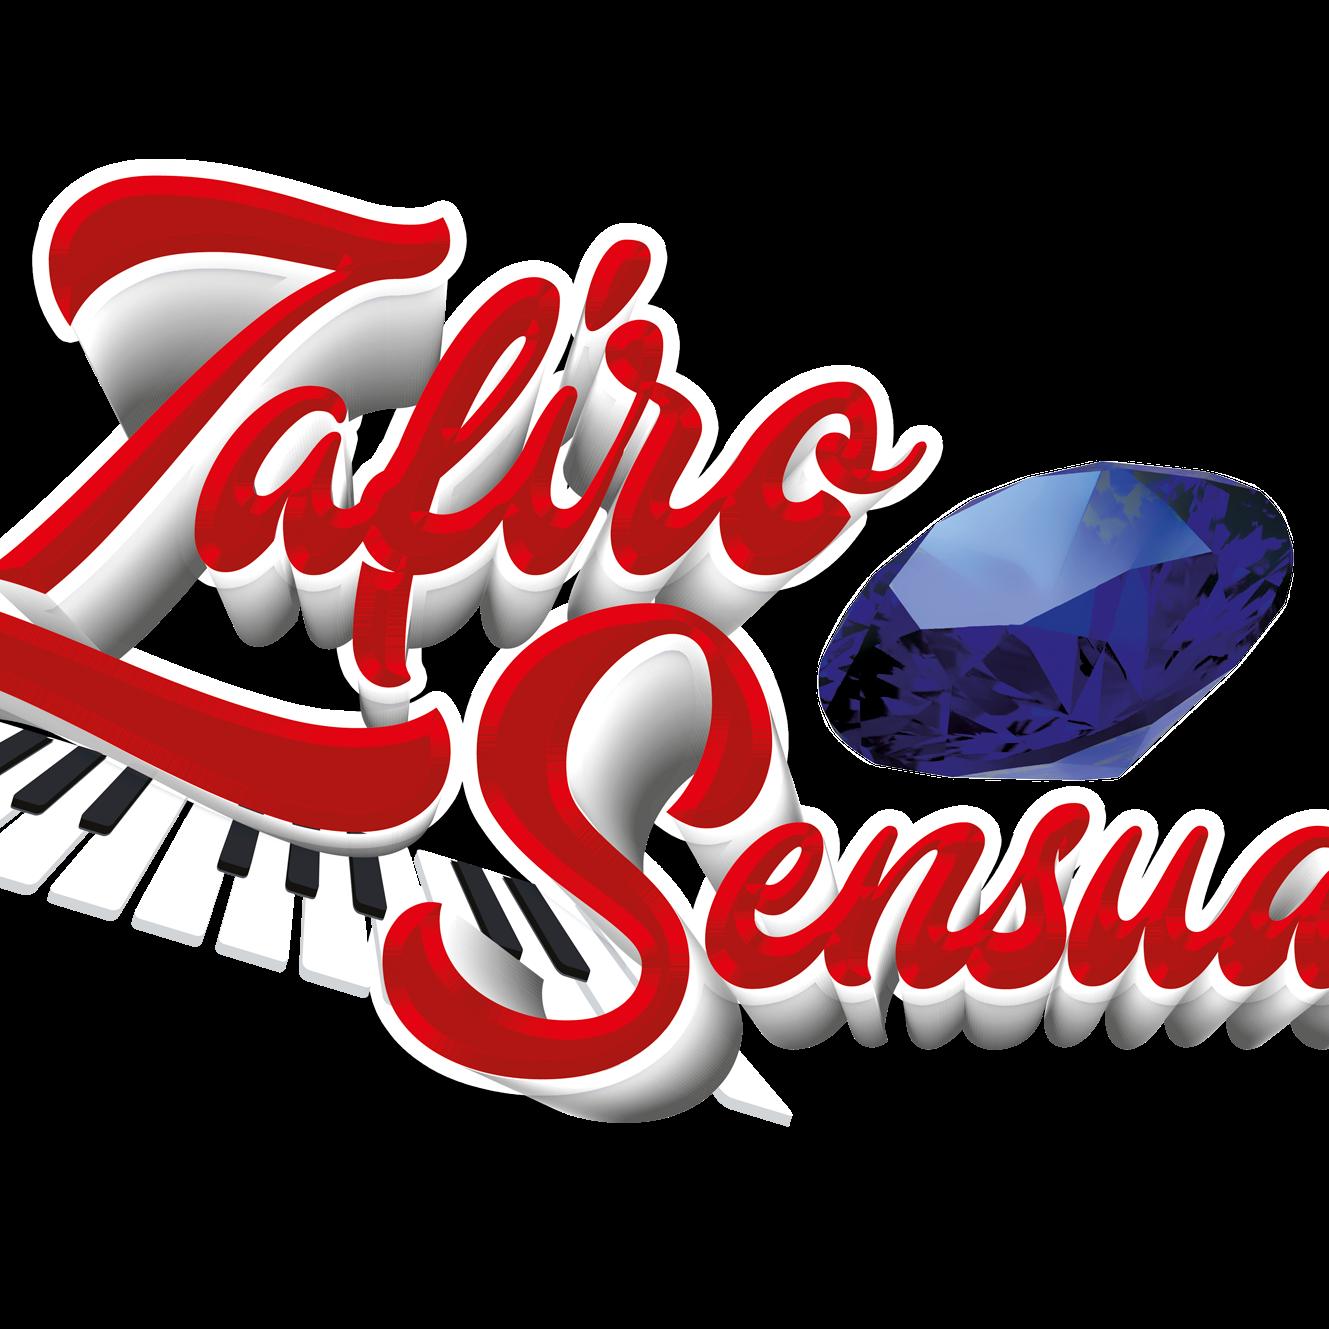 ZAFIRO SENSUAL